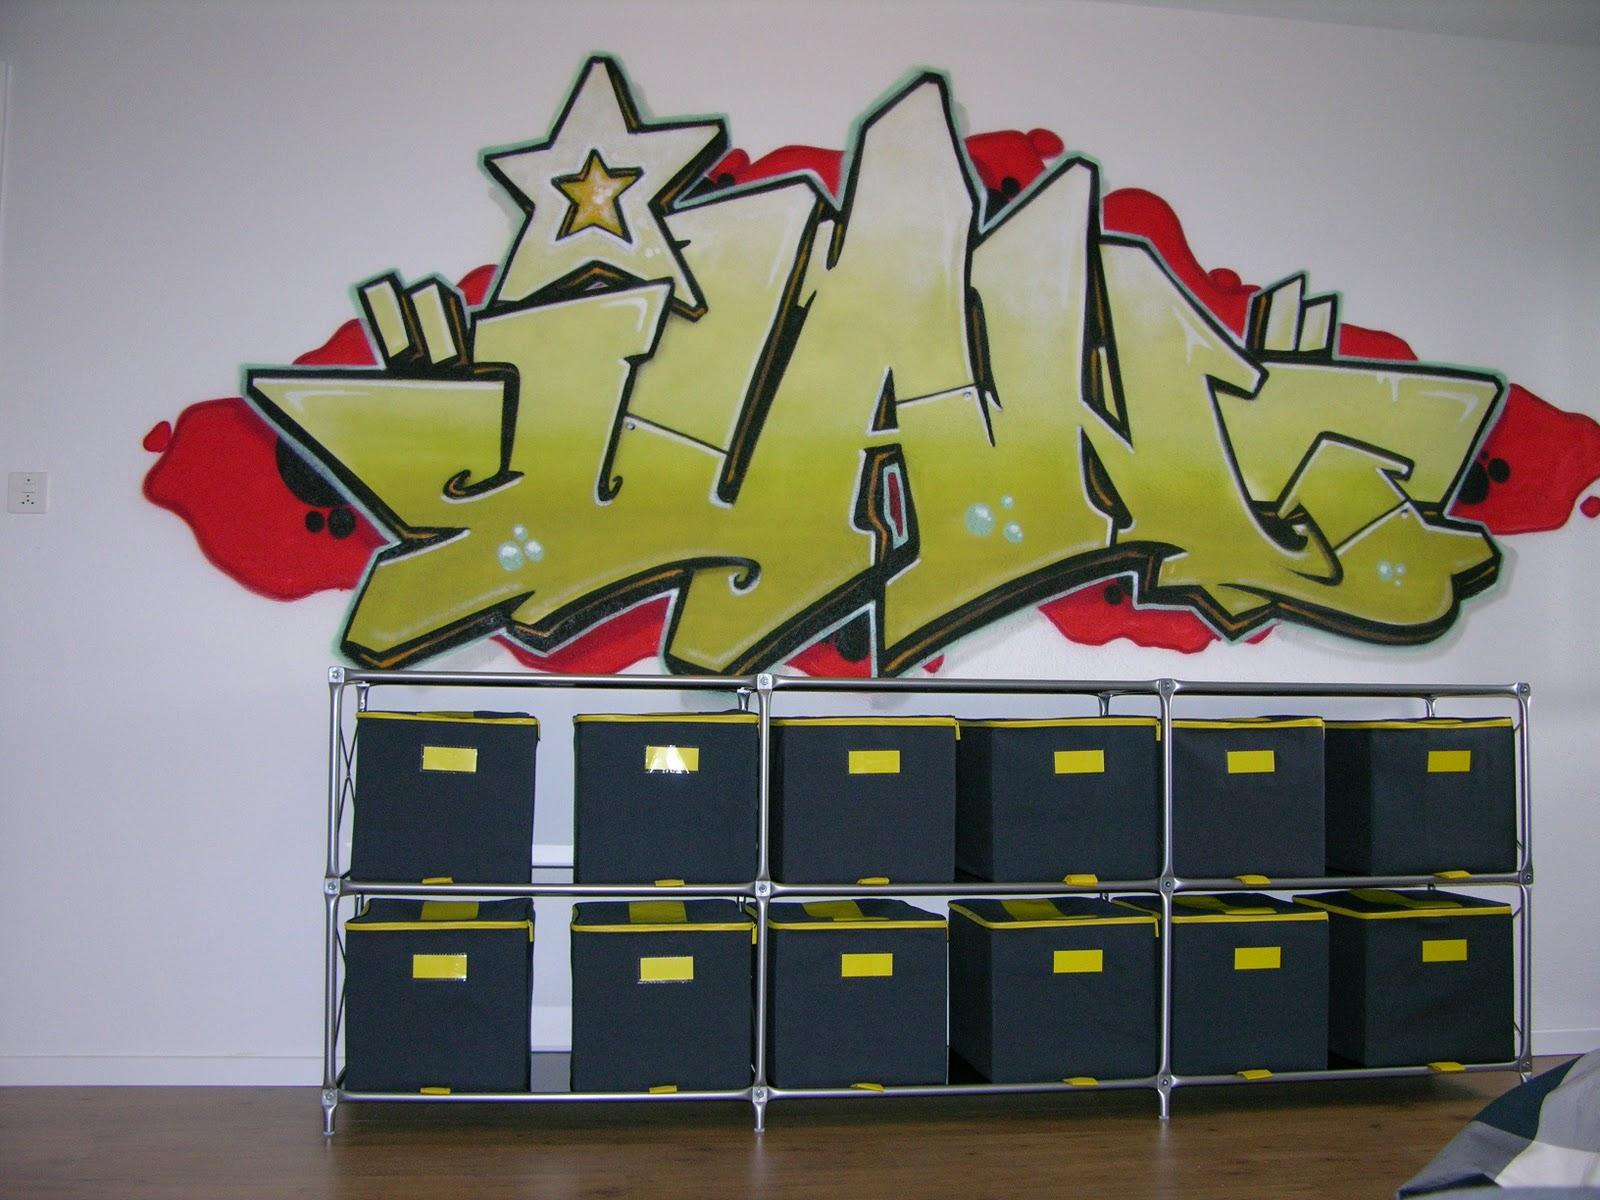 graffiti sprayer in kinderzimmer. Black Bedroom Furniture Sets. Home Design Ideas